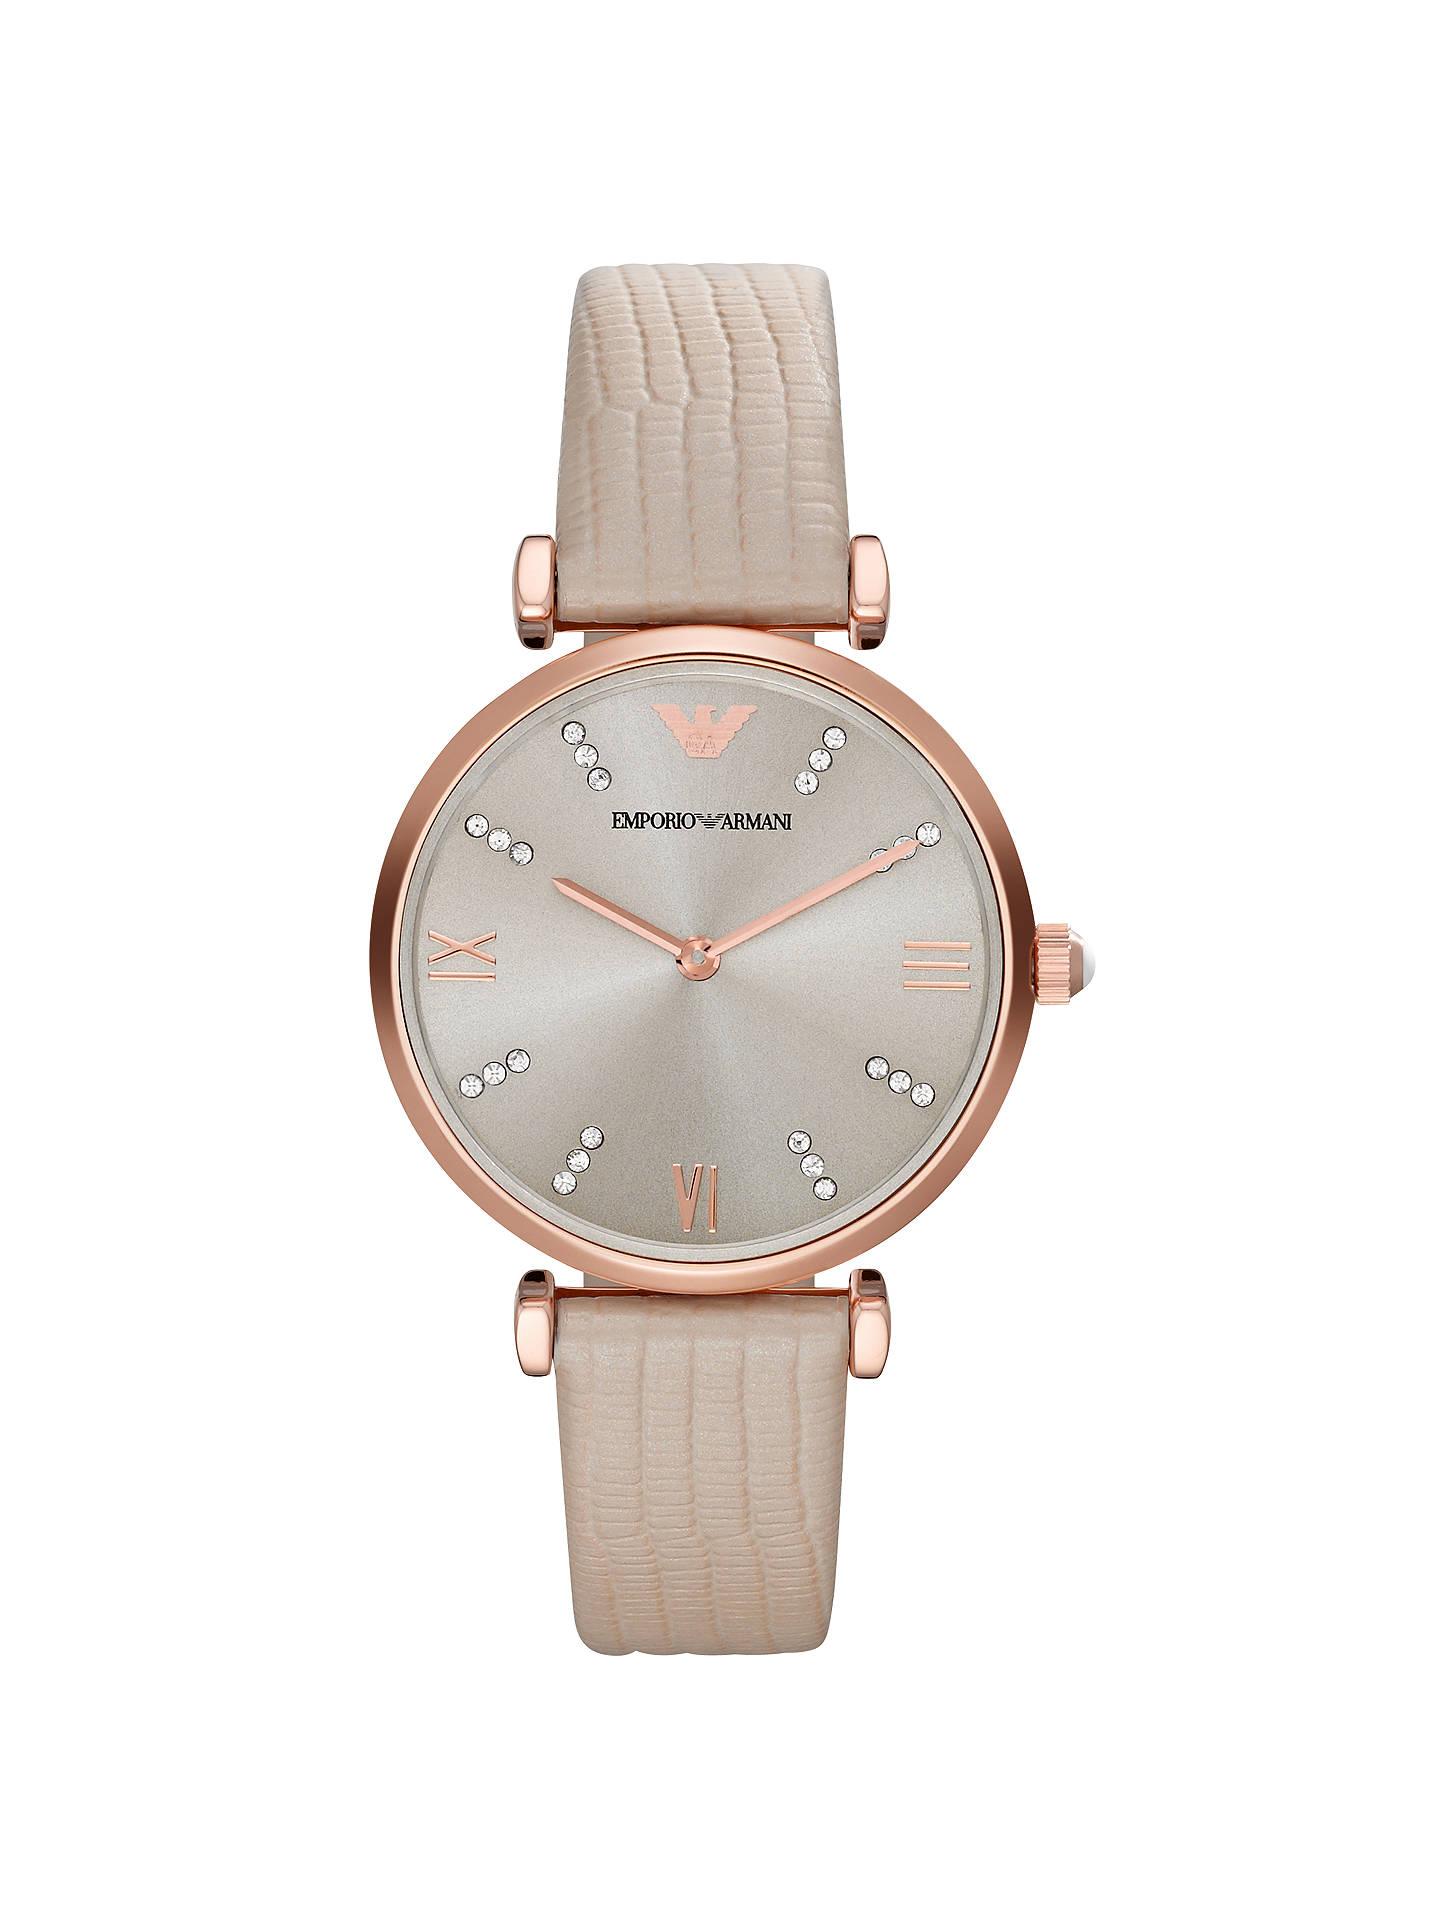 53349b28c7 Emporio Armani AR1681 Women's Leather Strap Watch, Cream/Silver